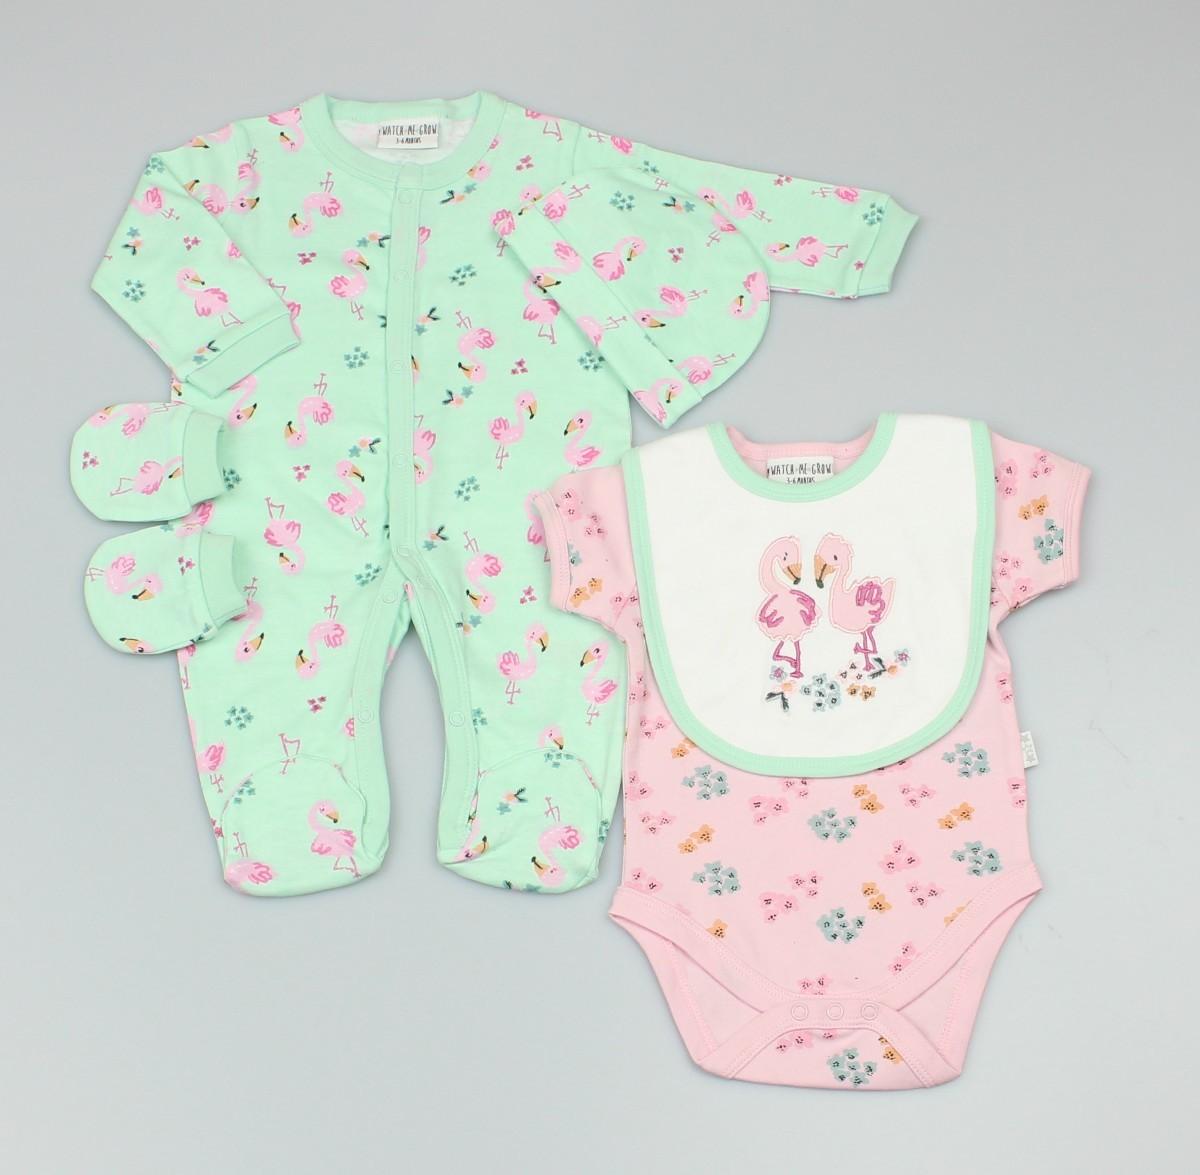 Baby 5pc Layette Gift Set - Sleepsuit, Bodysuit, Bib, Cap And Mitts